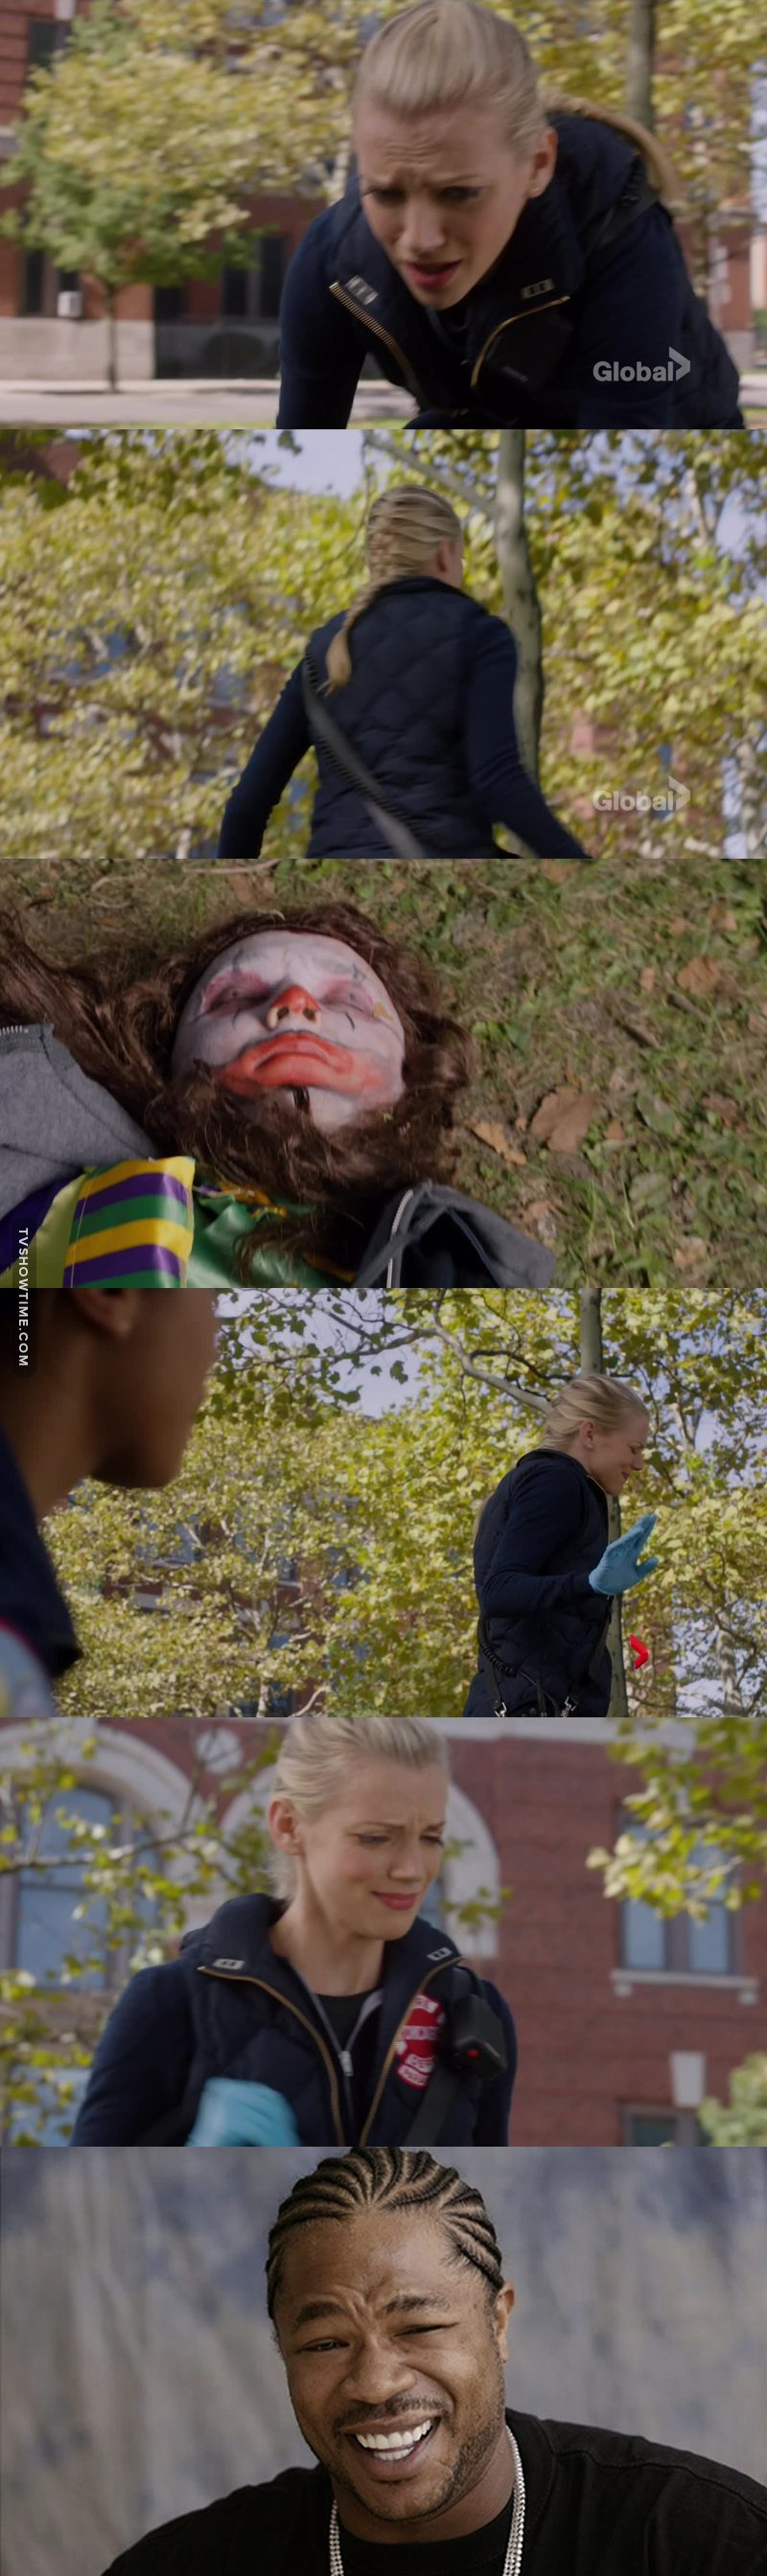 Sylvie killed me in this scene 😂😂😂😂😂😂